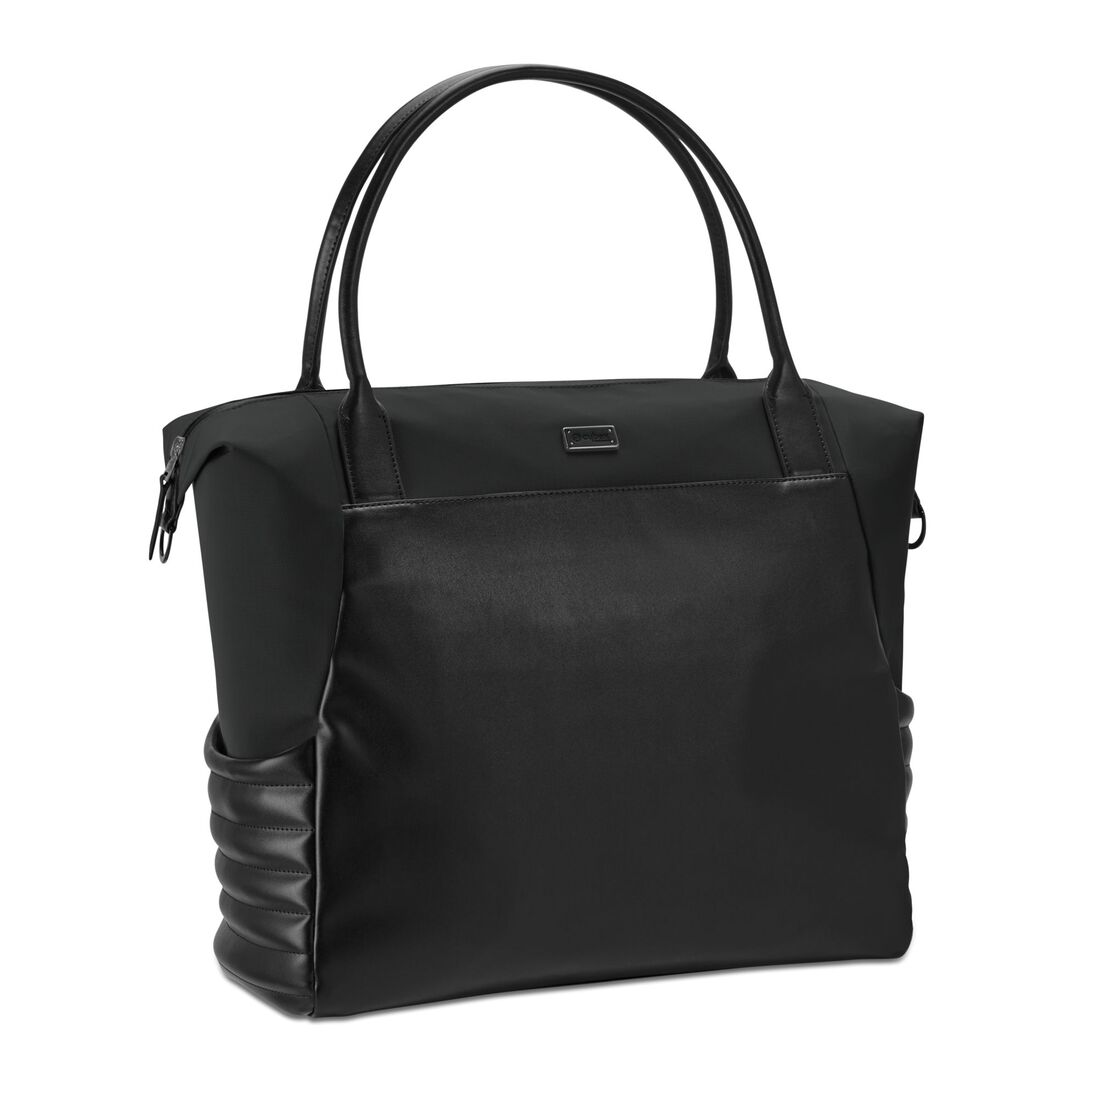 CYBEX Priam Changing Bag - Deep Black in Deep Black large image number 2